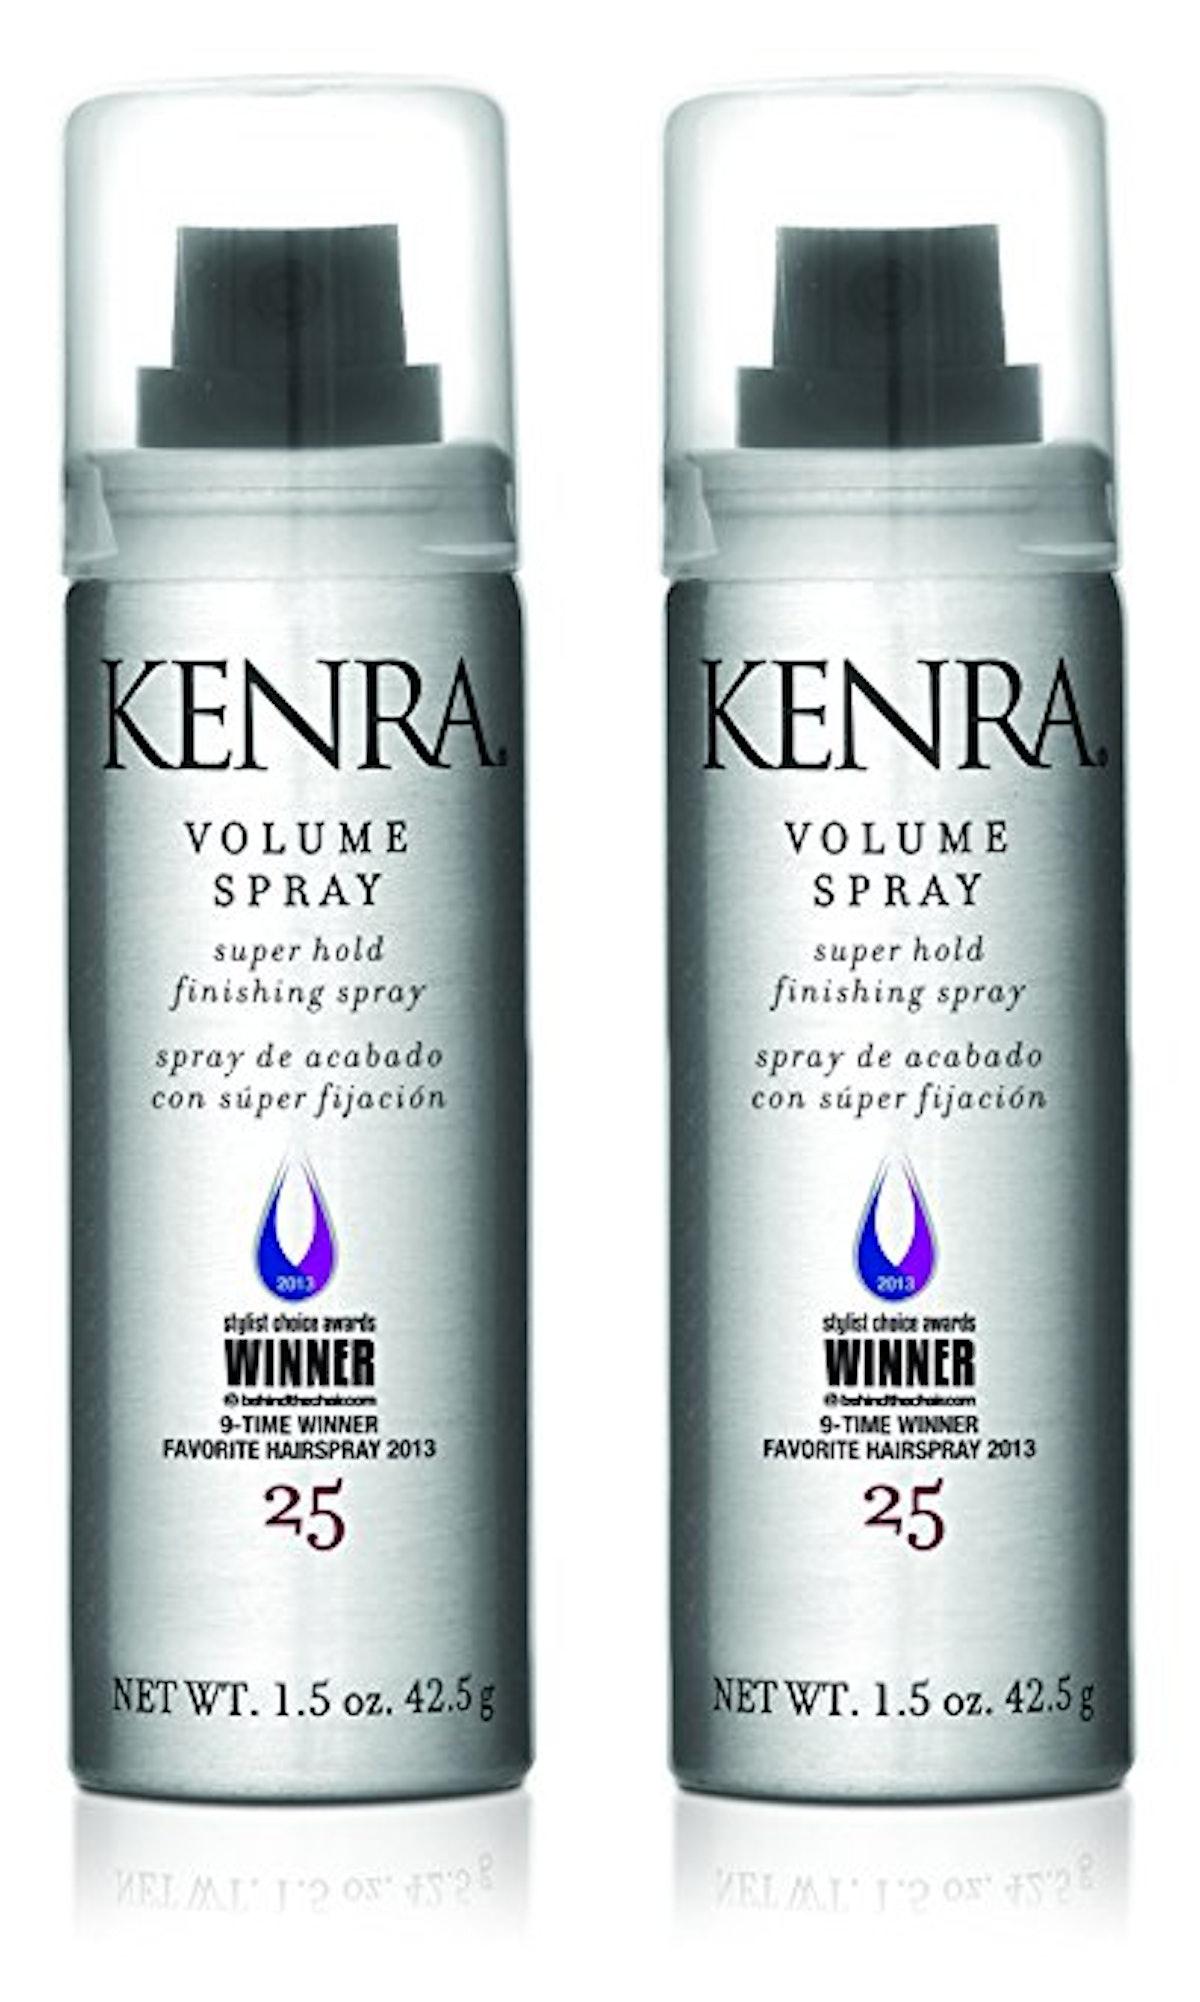 Kenra Volume Spray #25 (2 Pack)